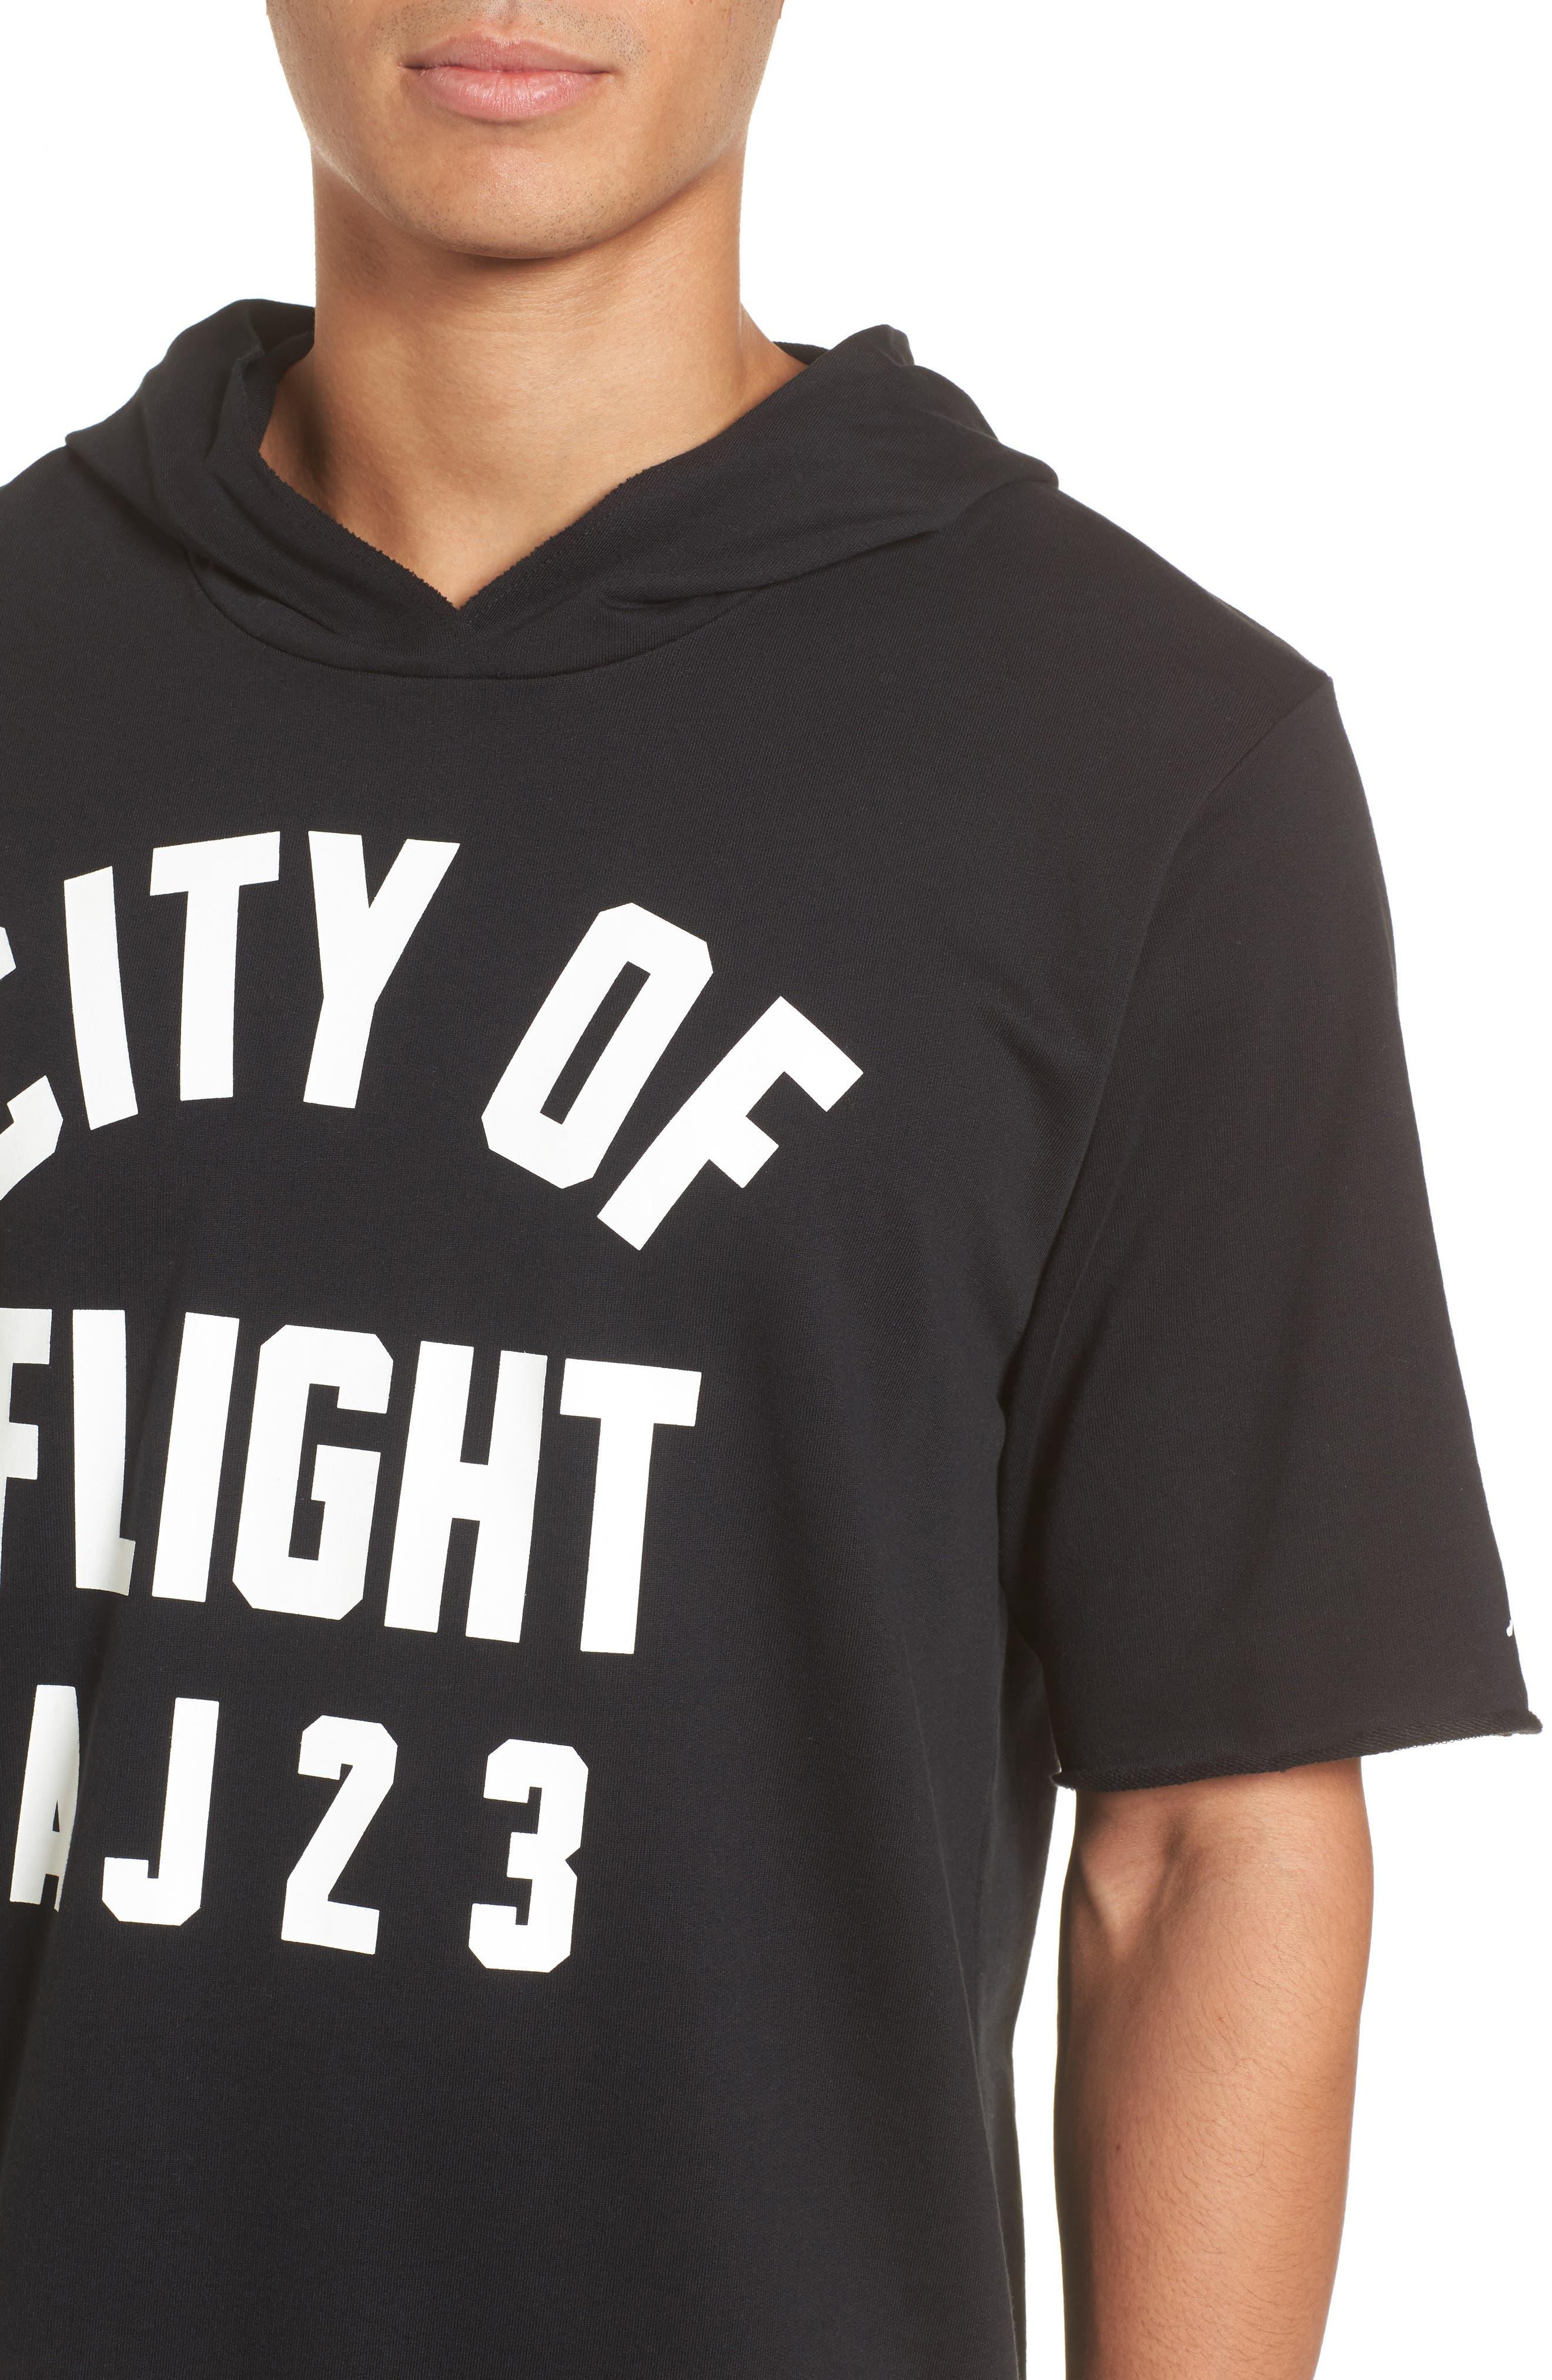 Sportswear City of Flight Hooded T-Shirt,                             Alternate thumbnail 4, color,                             010